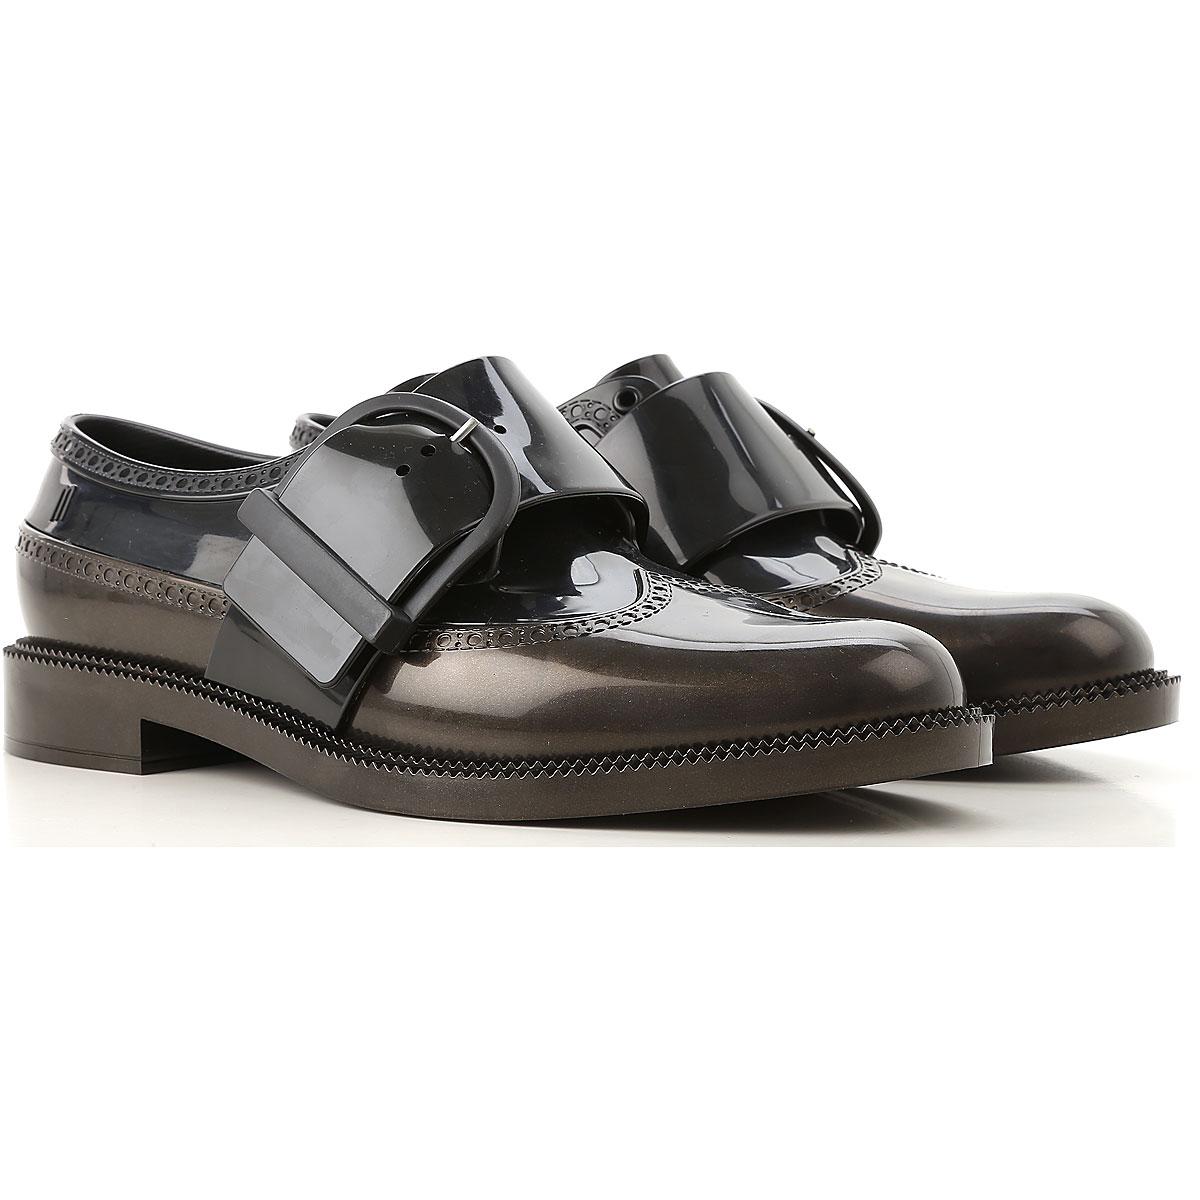 Image of Melissa Monk Strap Shoes, Black, PVC, 2017, USA 6 - EUR 37 USA 7 - EUR 38 USA 8 - EUR 39 USA 9 - EUR 40